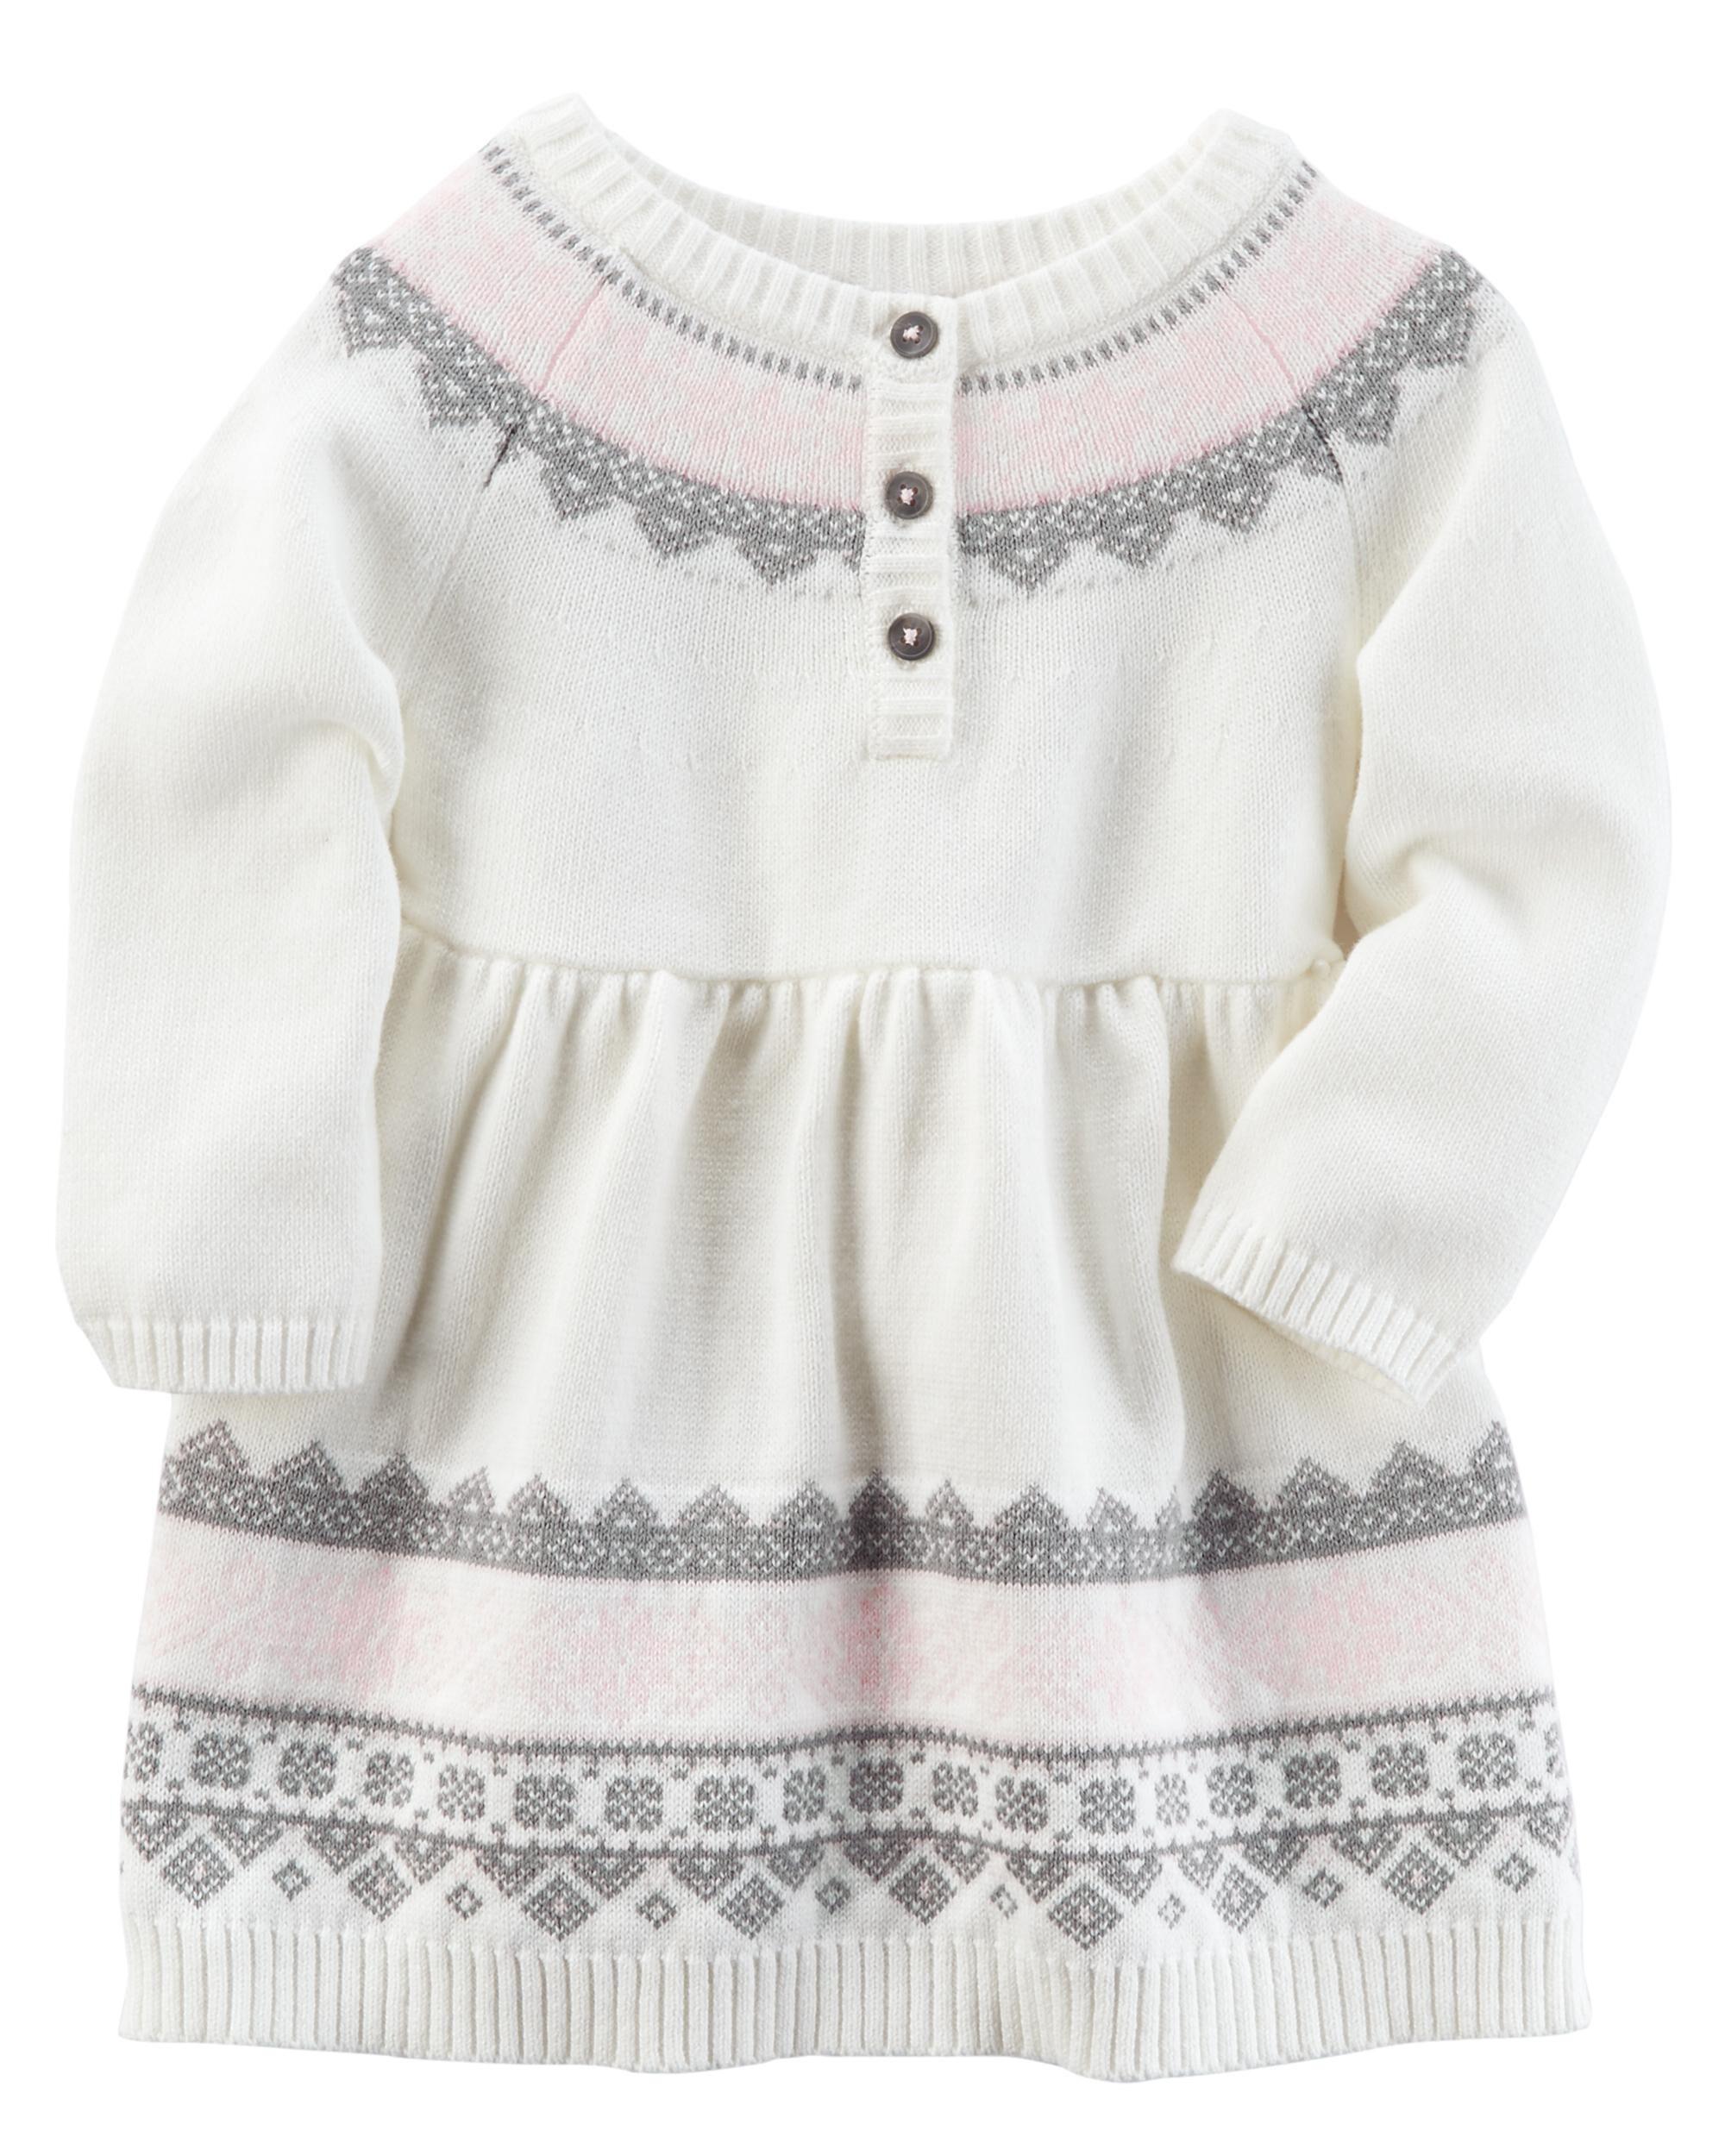 Sweater Knit Dress Carters Com